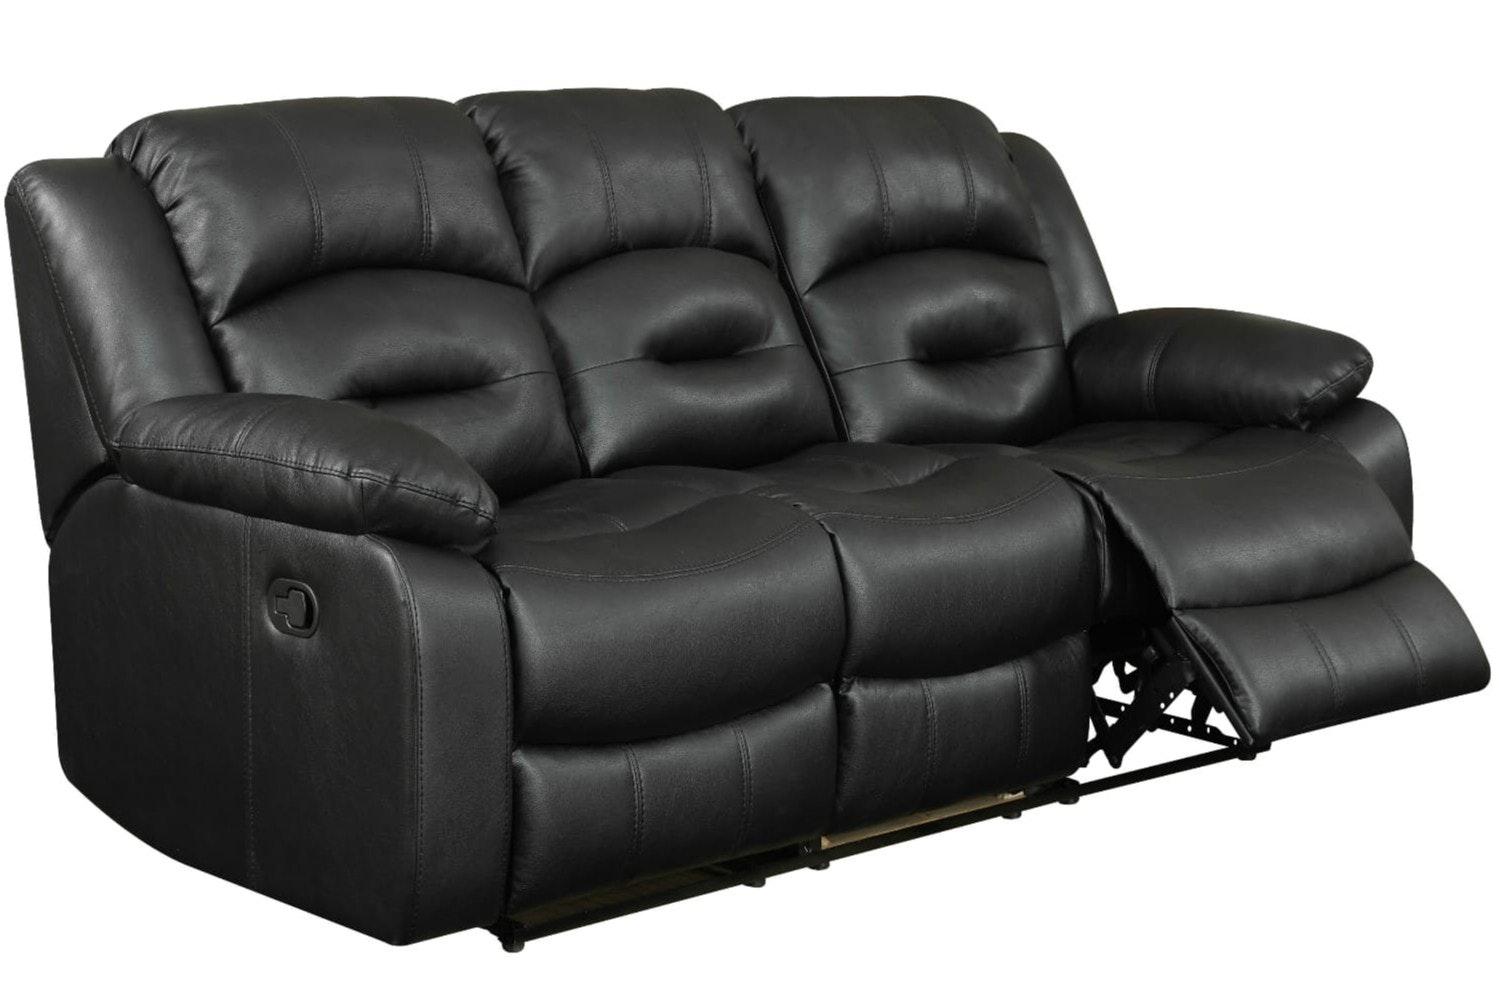 Hunter 3 Seater Recliner Sofa Harvey Norman Sofas Ireland ~ Three Seater Recliner Sofa